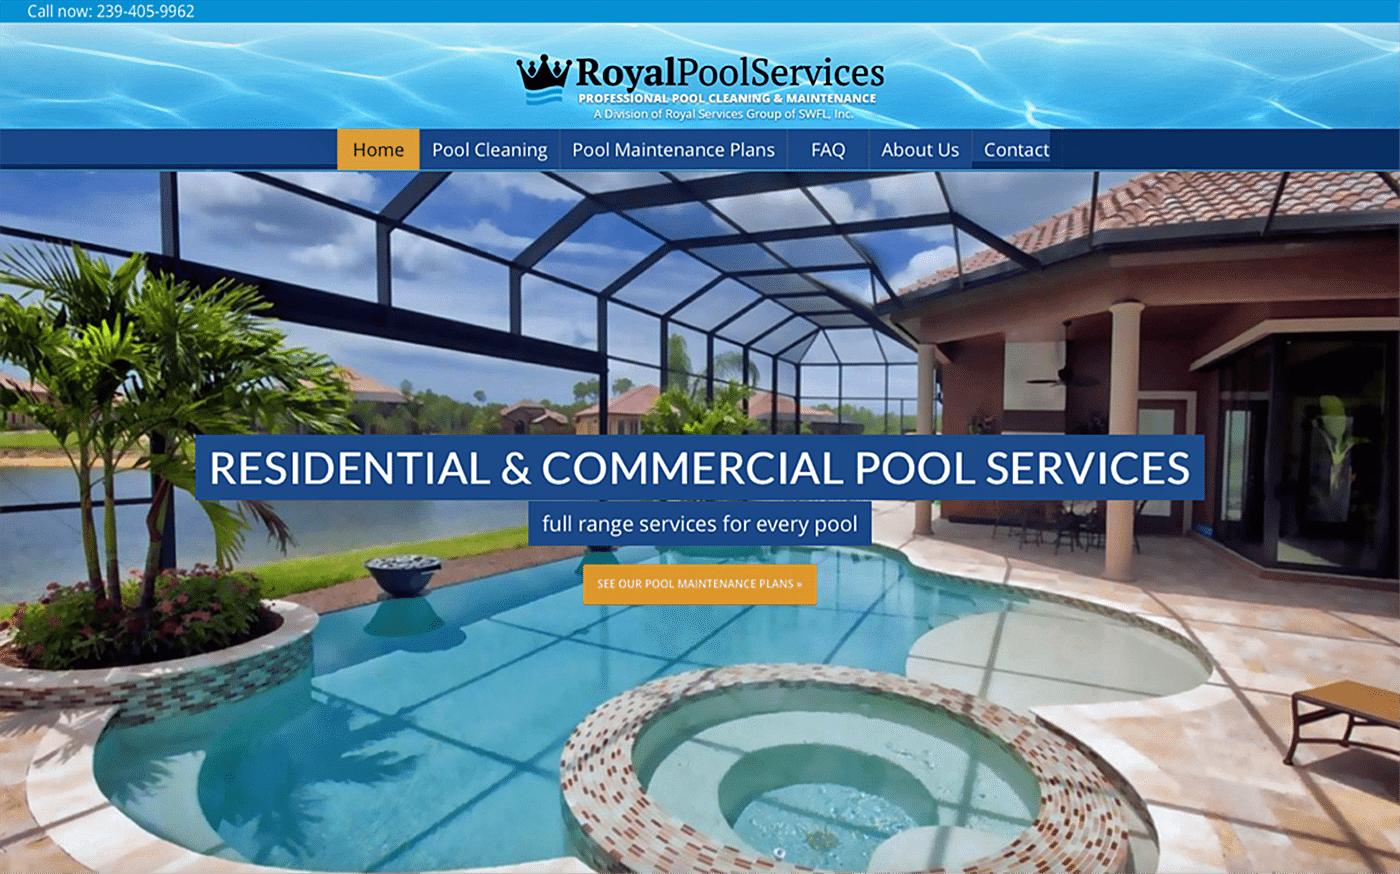 Contractor Marketing Agency - Contractor Marketing Campaign Creative: Pool